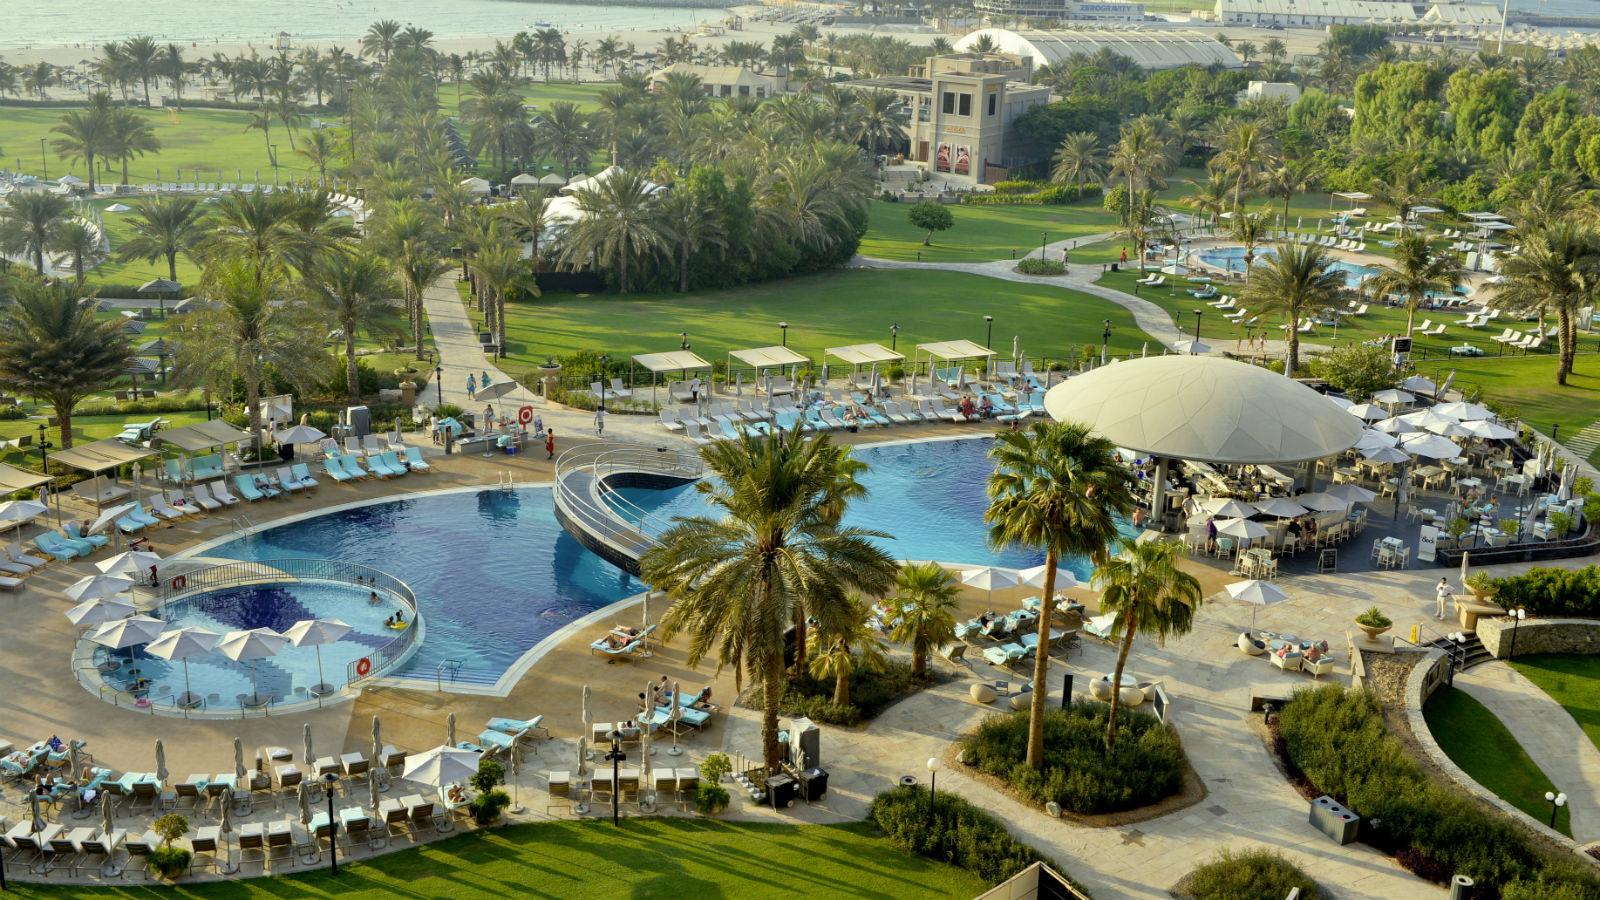 le-royal-meridien-beach-resort-and-spa-dubai.jpg